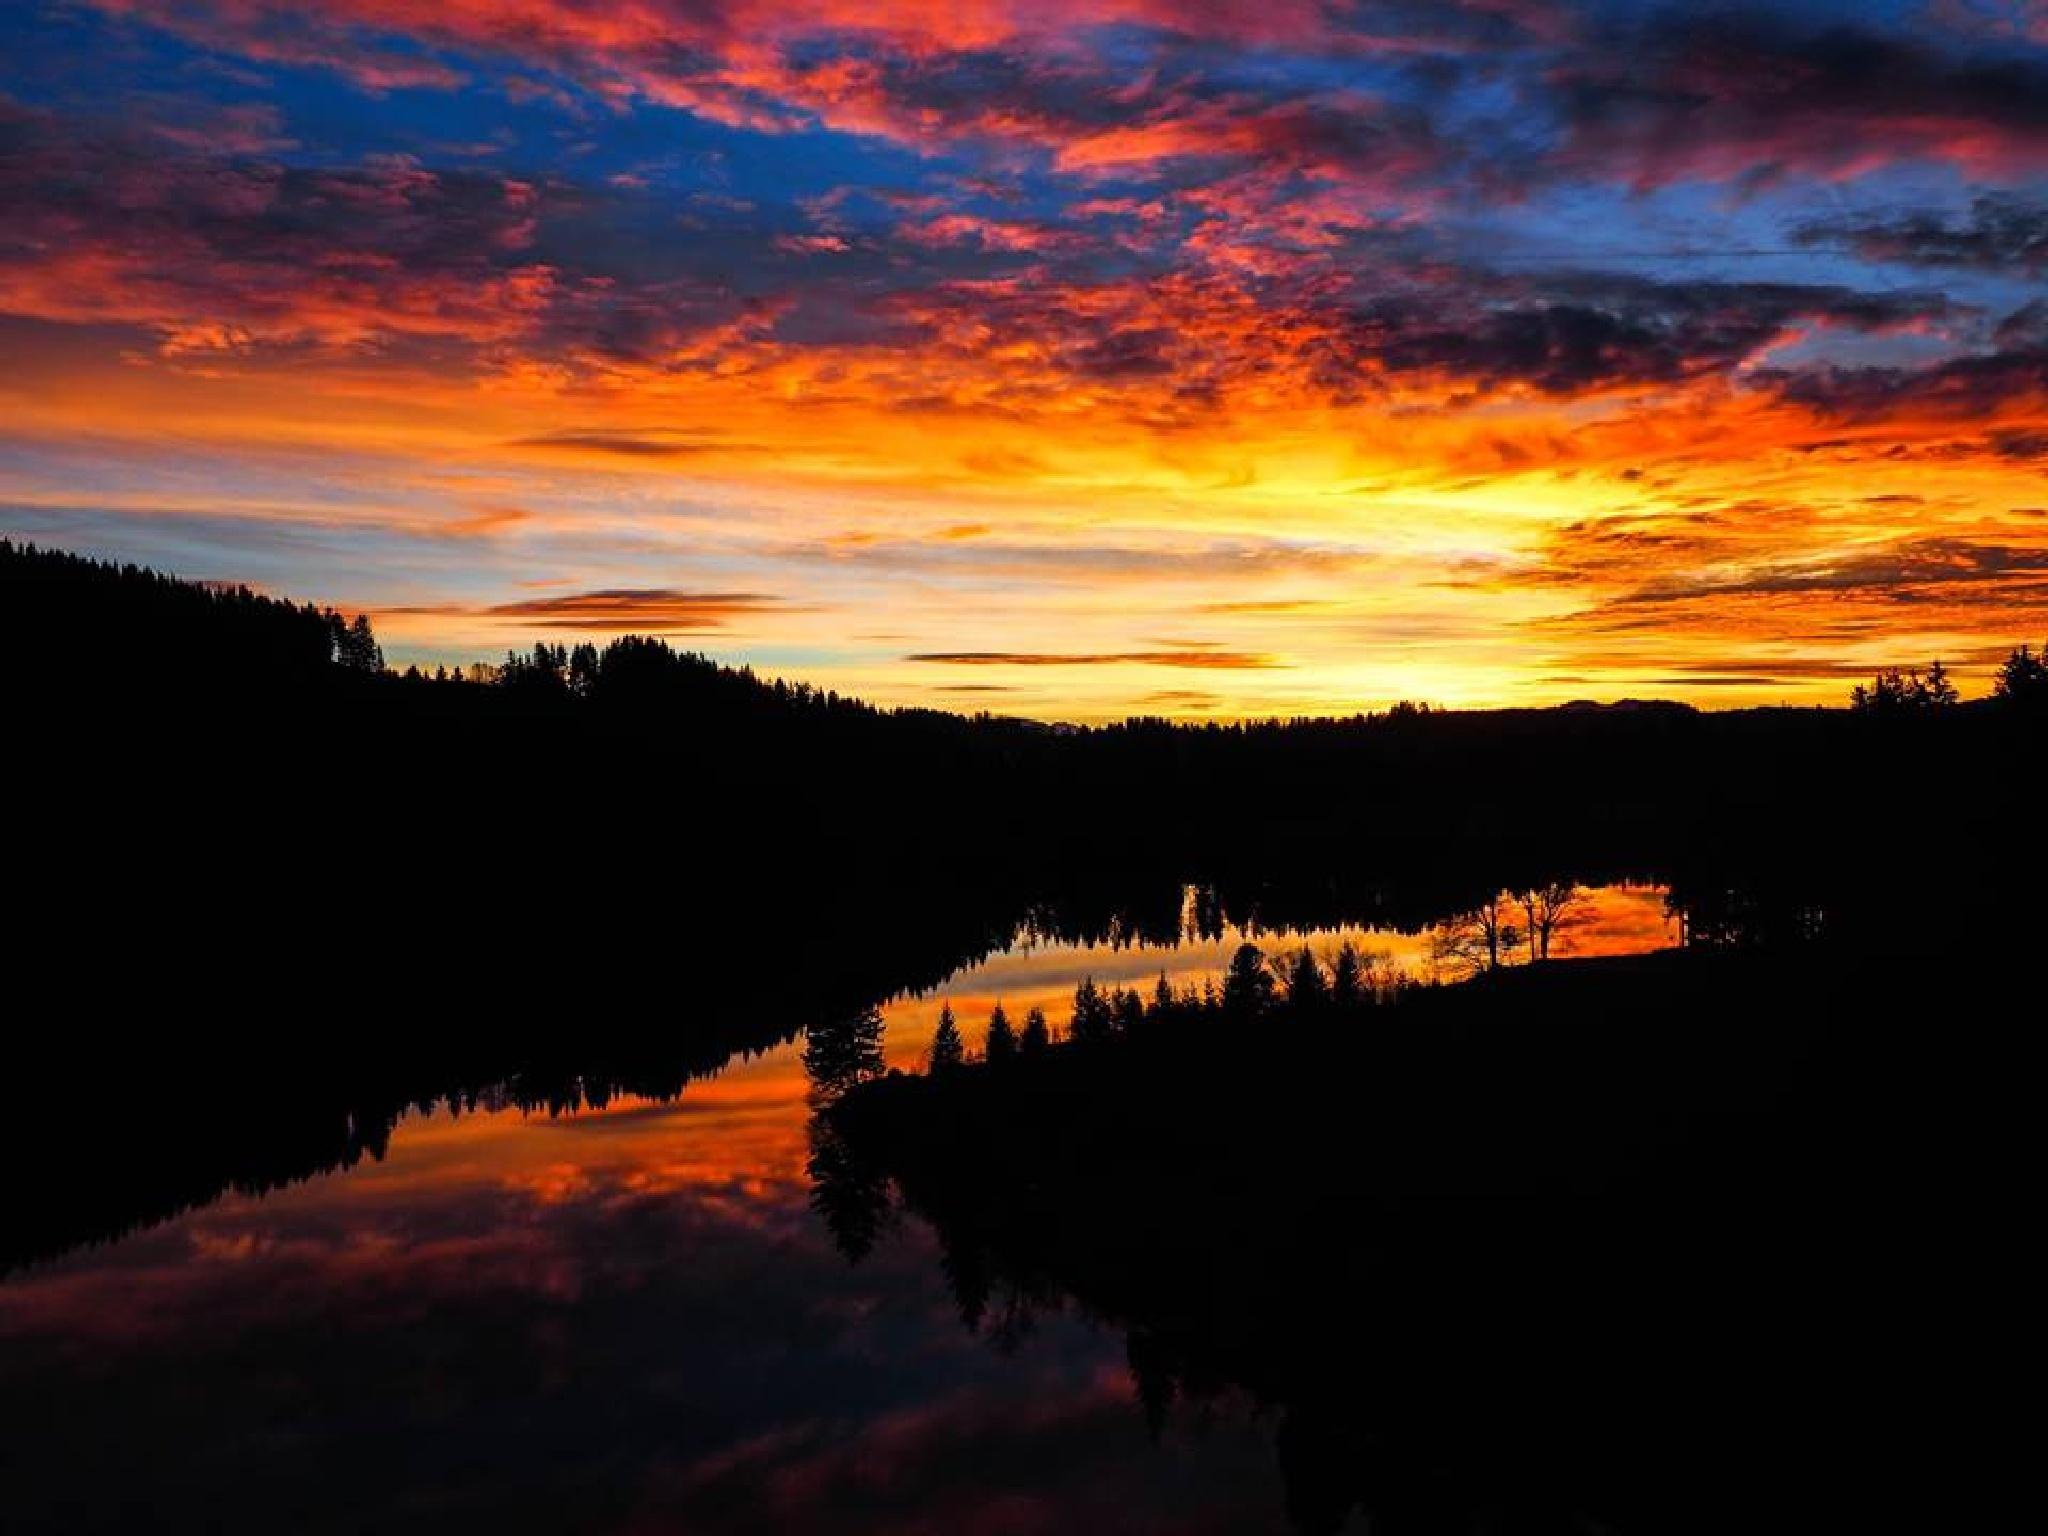 Spectecular sunset by KALAcolumn_photo